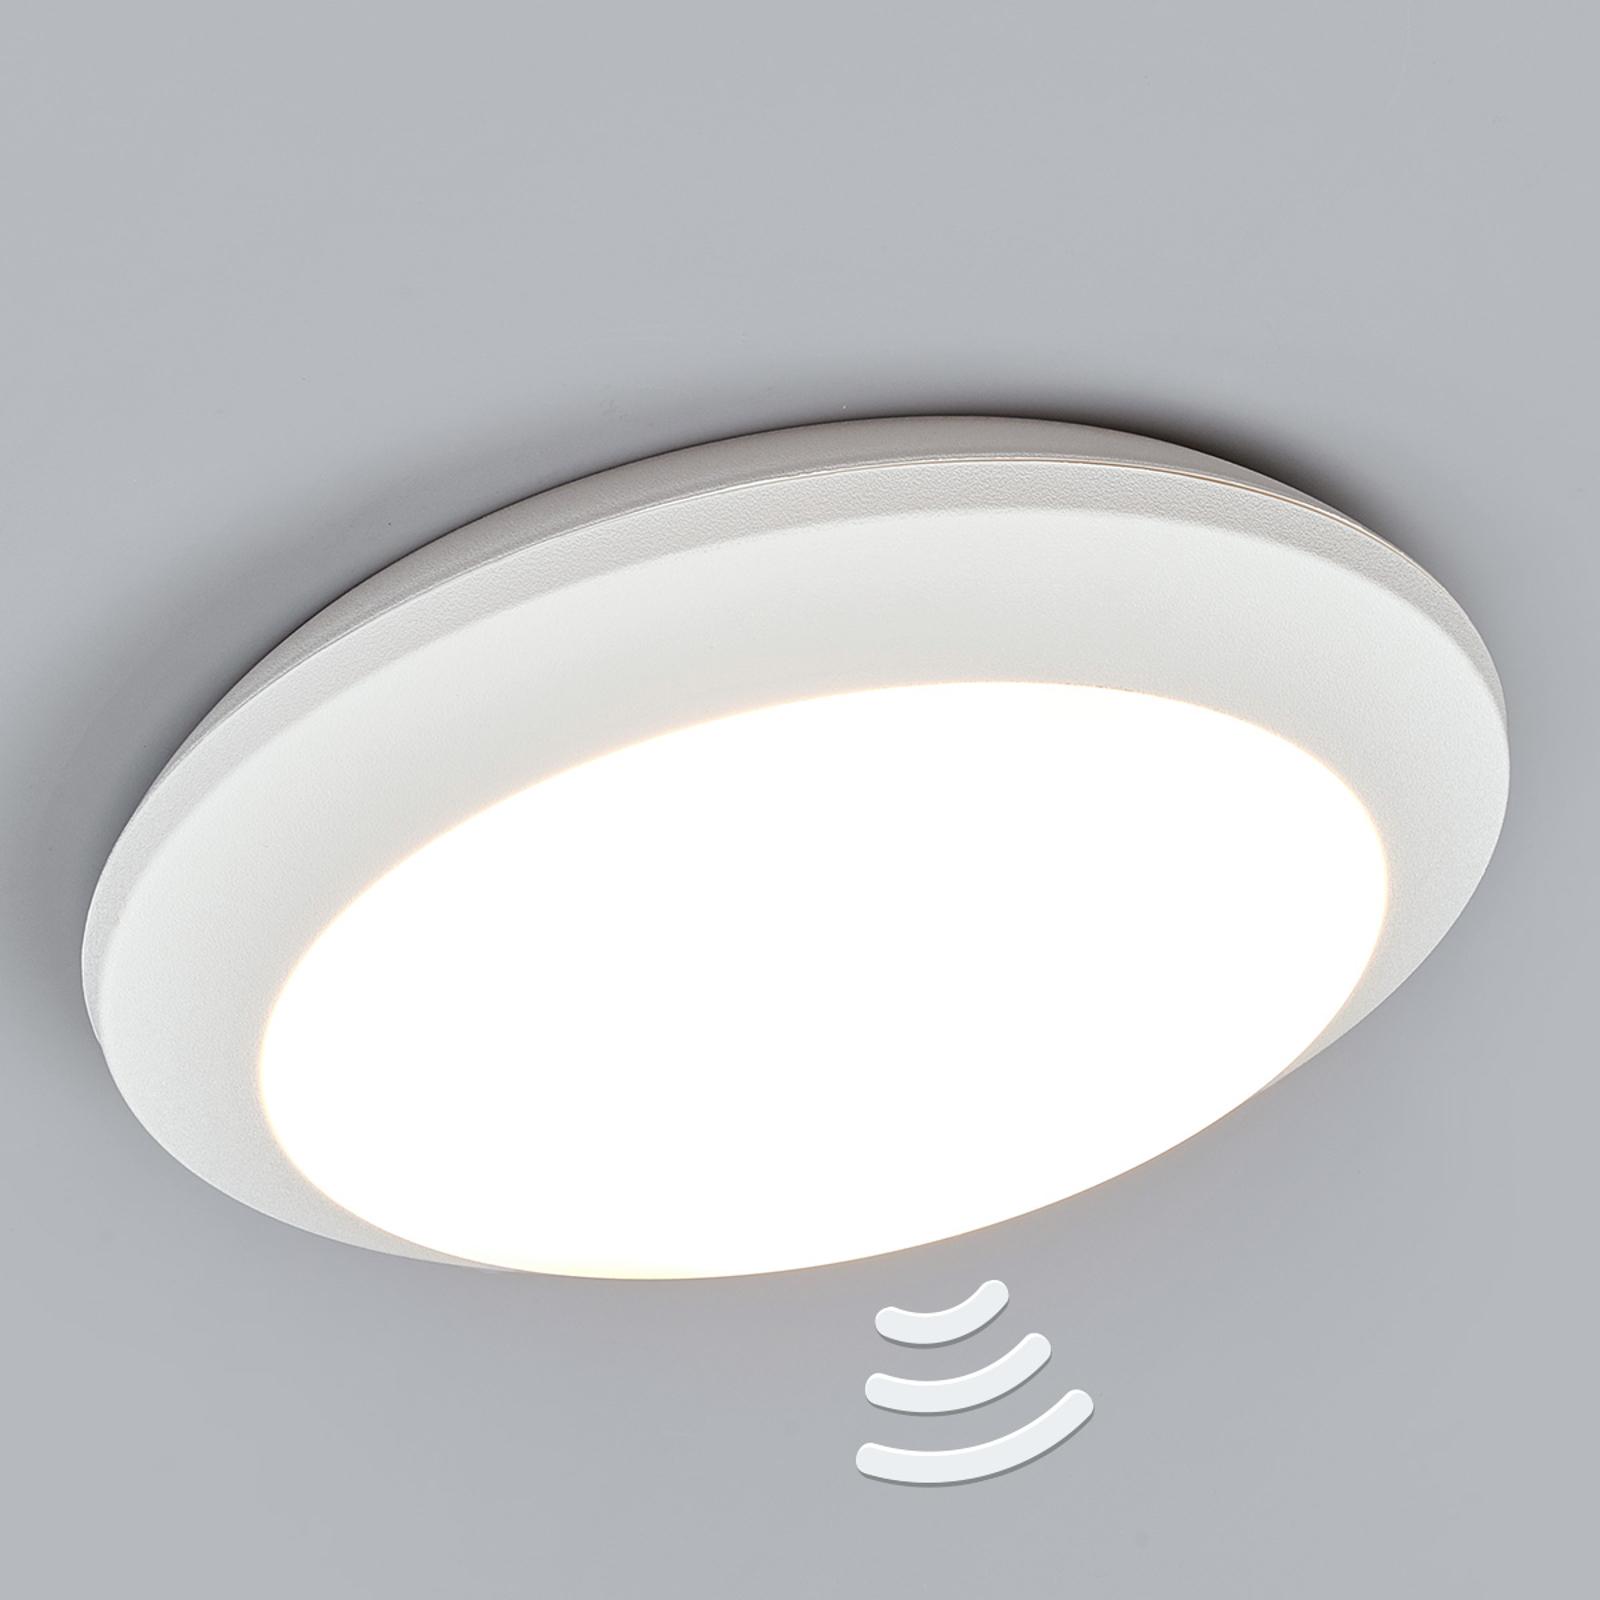 Biele senzorové svietidlo Umberta 11W 3000K